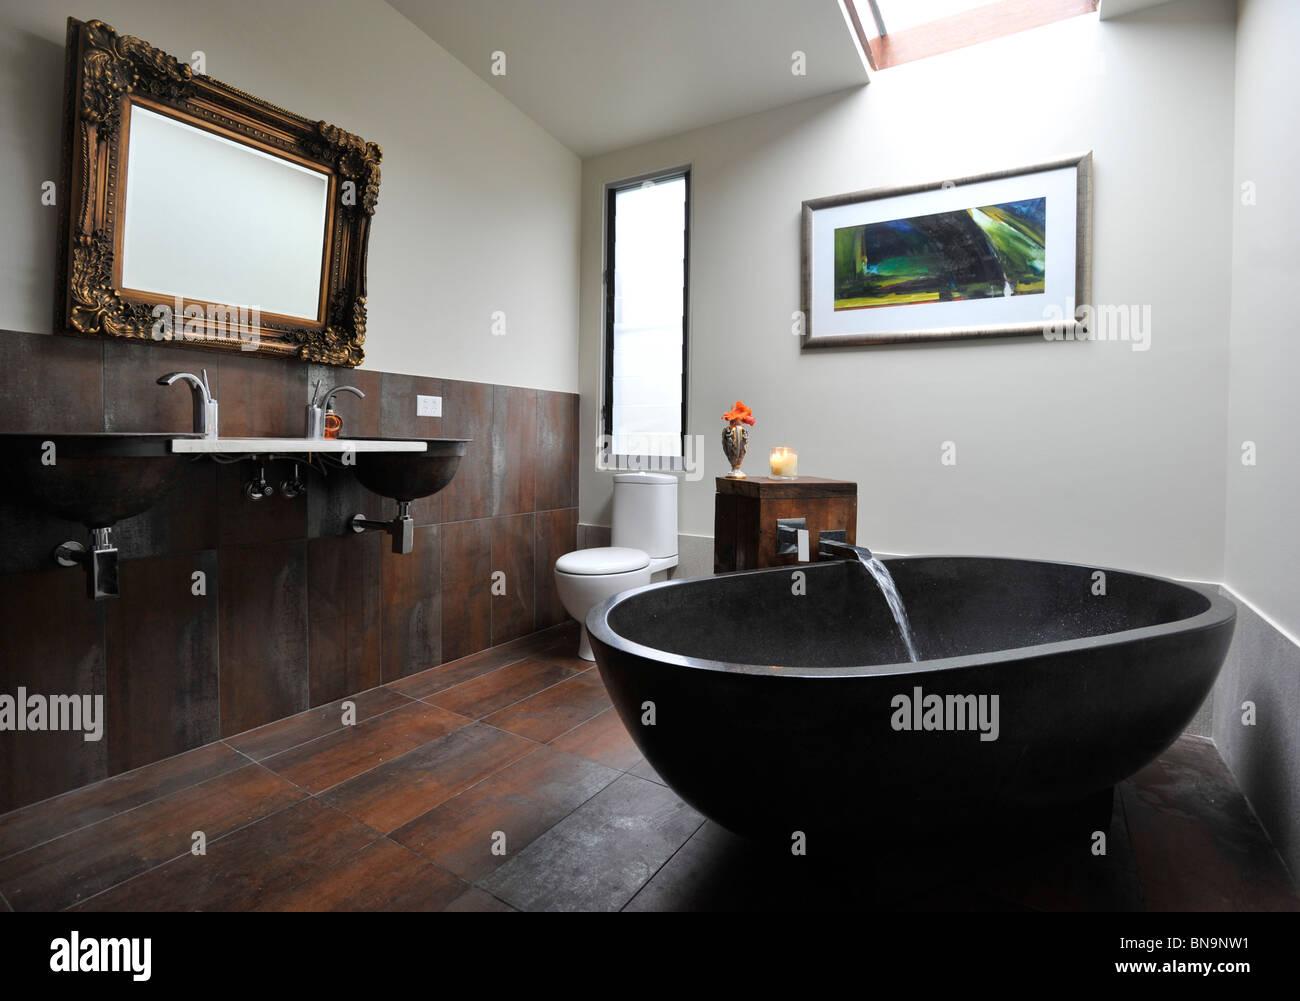 Bathroom in Contemporary home - Stock Image